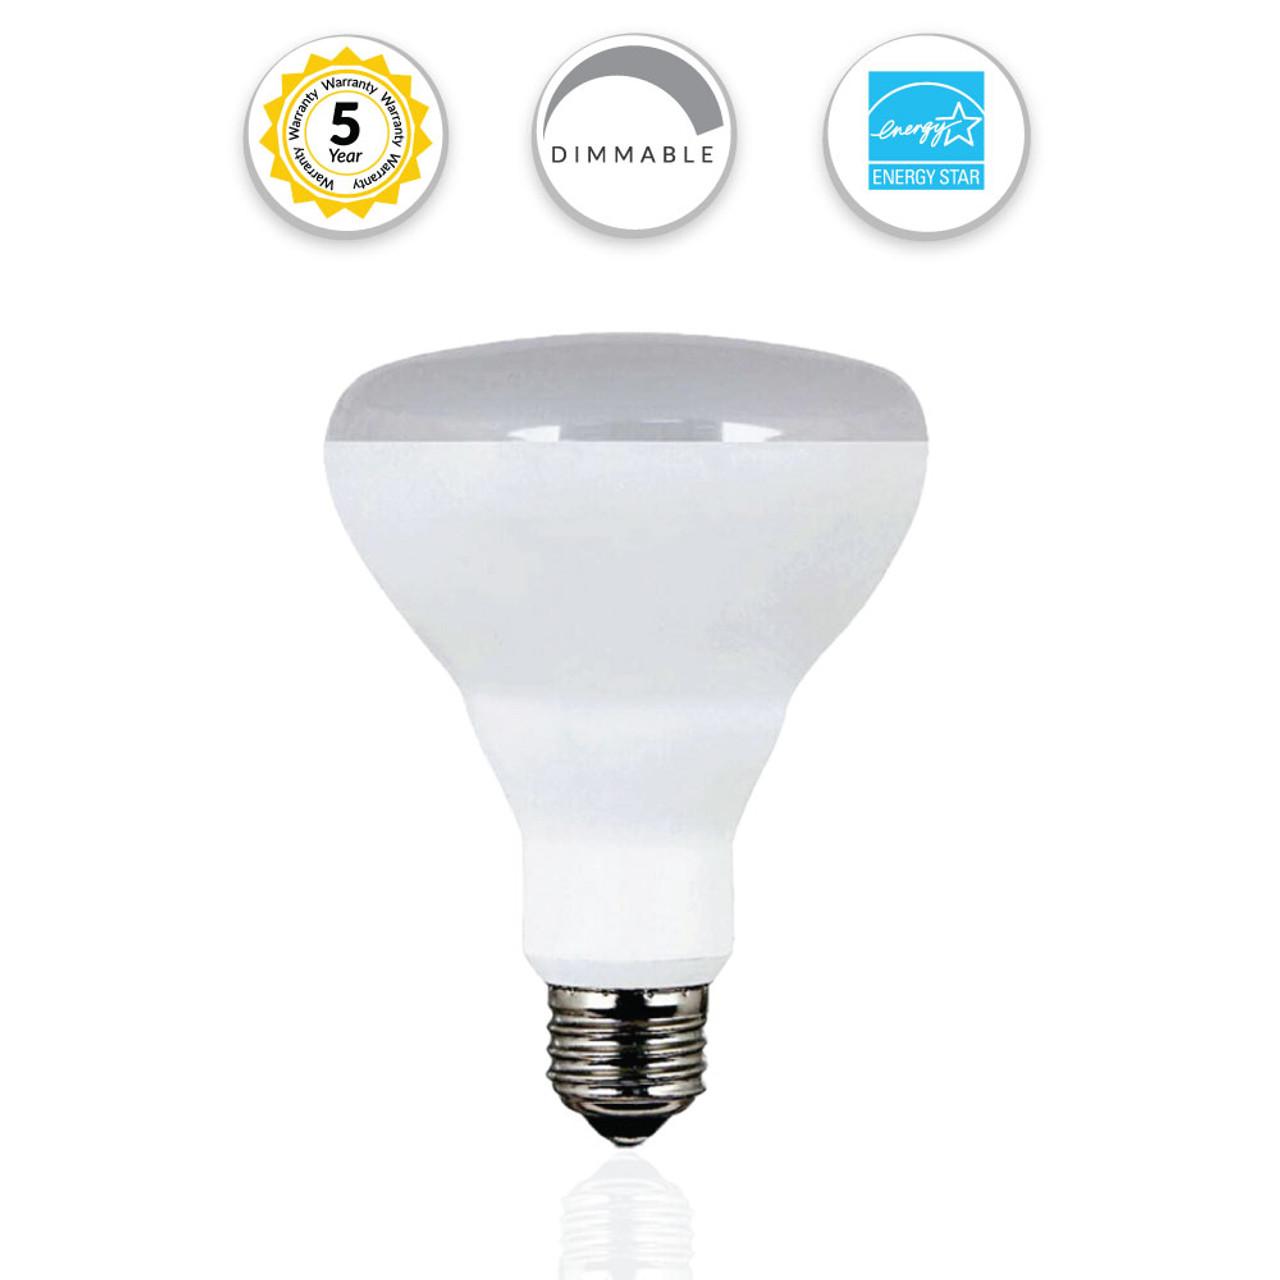 Sylvania Lighting BR30 65w 120-volt Indoor Flood Bulb 24 Pack